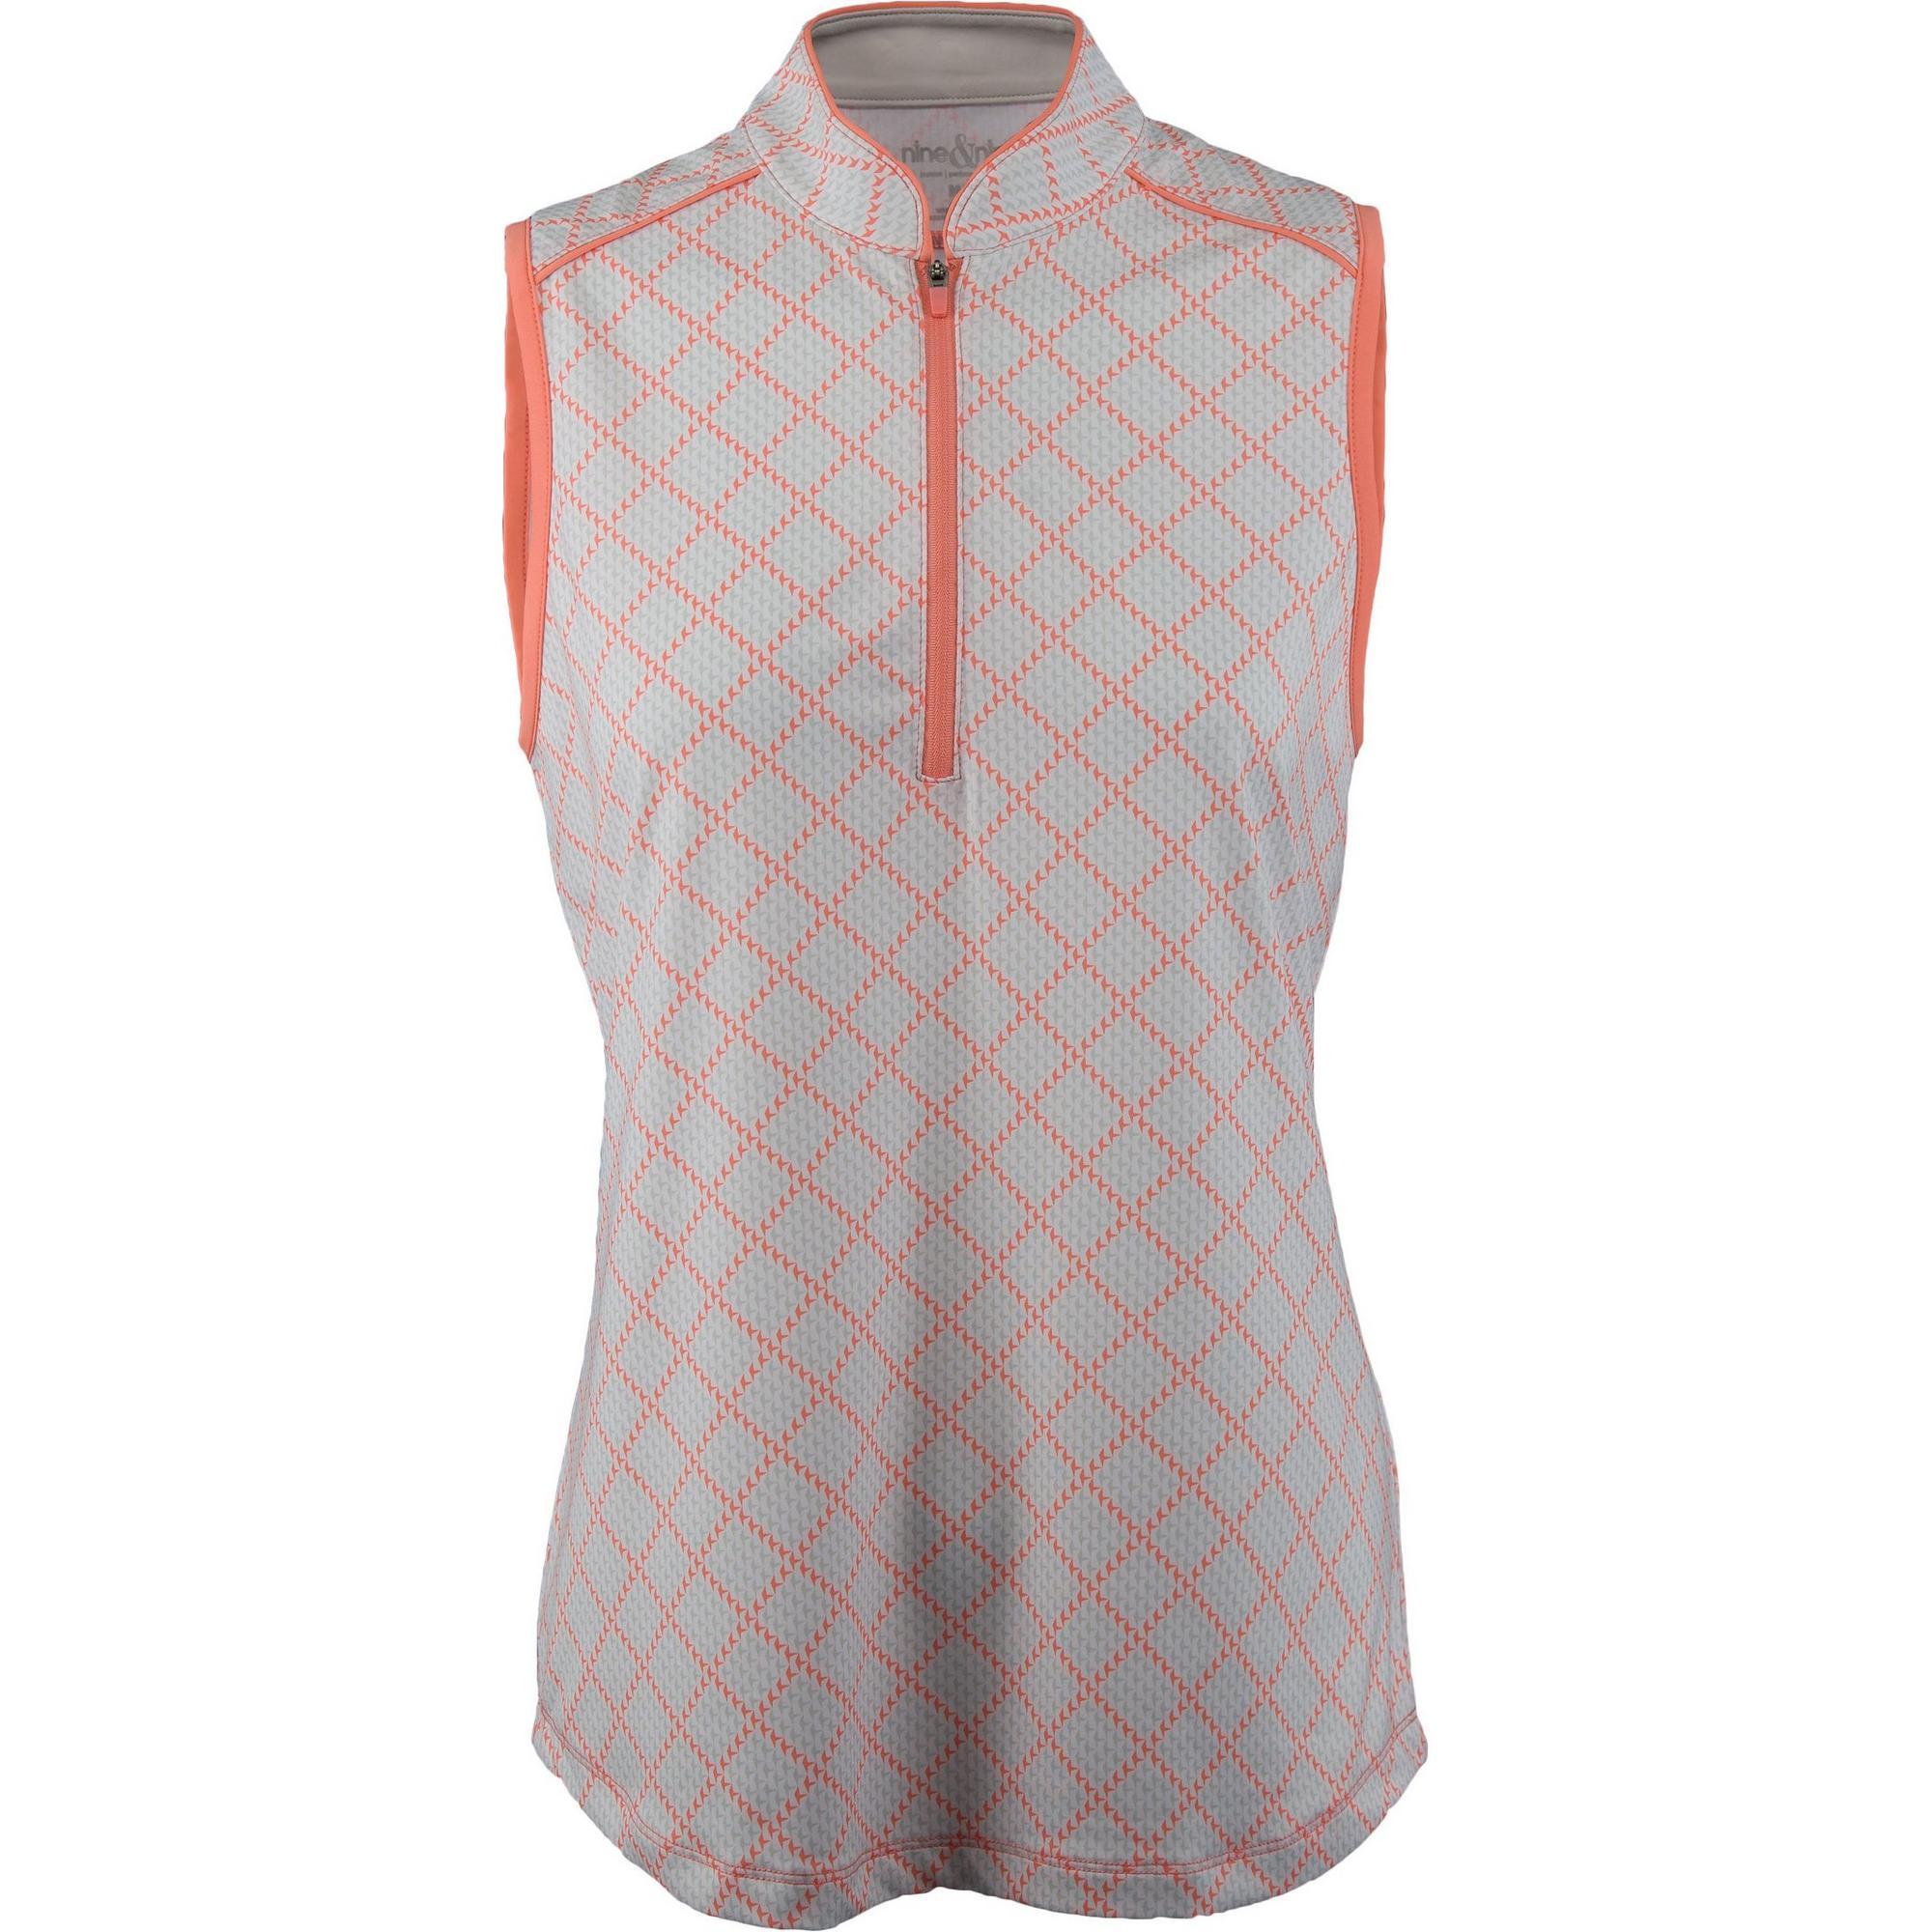 Women's Sleeveless Herringbone Check Print Mock Neck Top